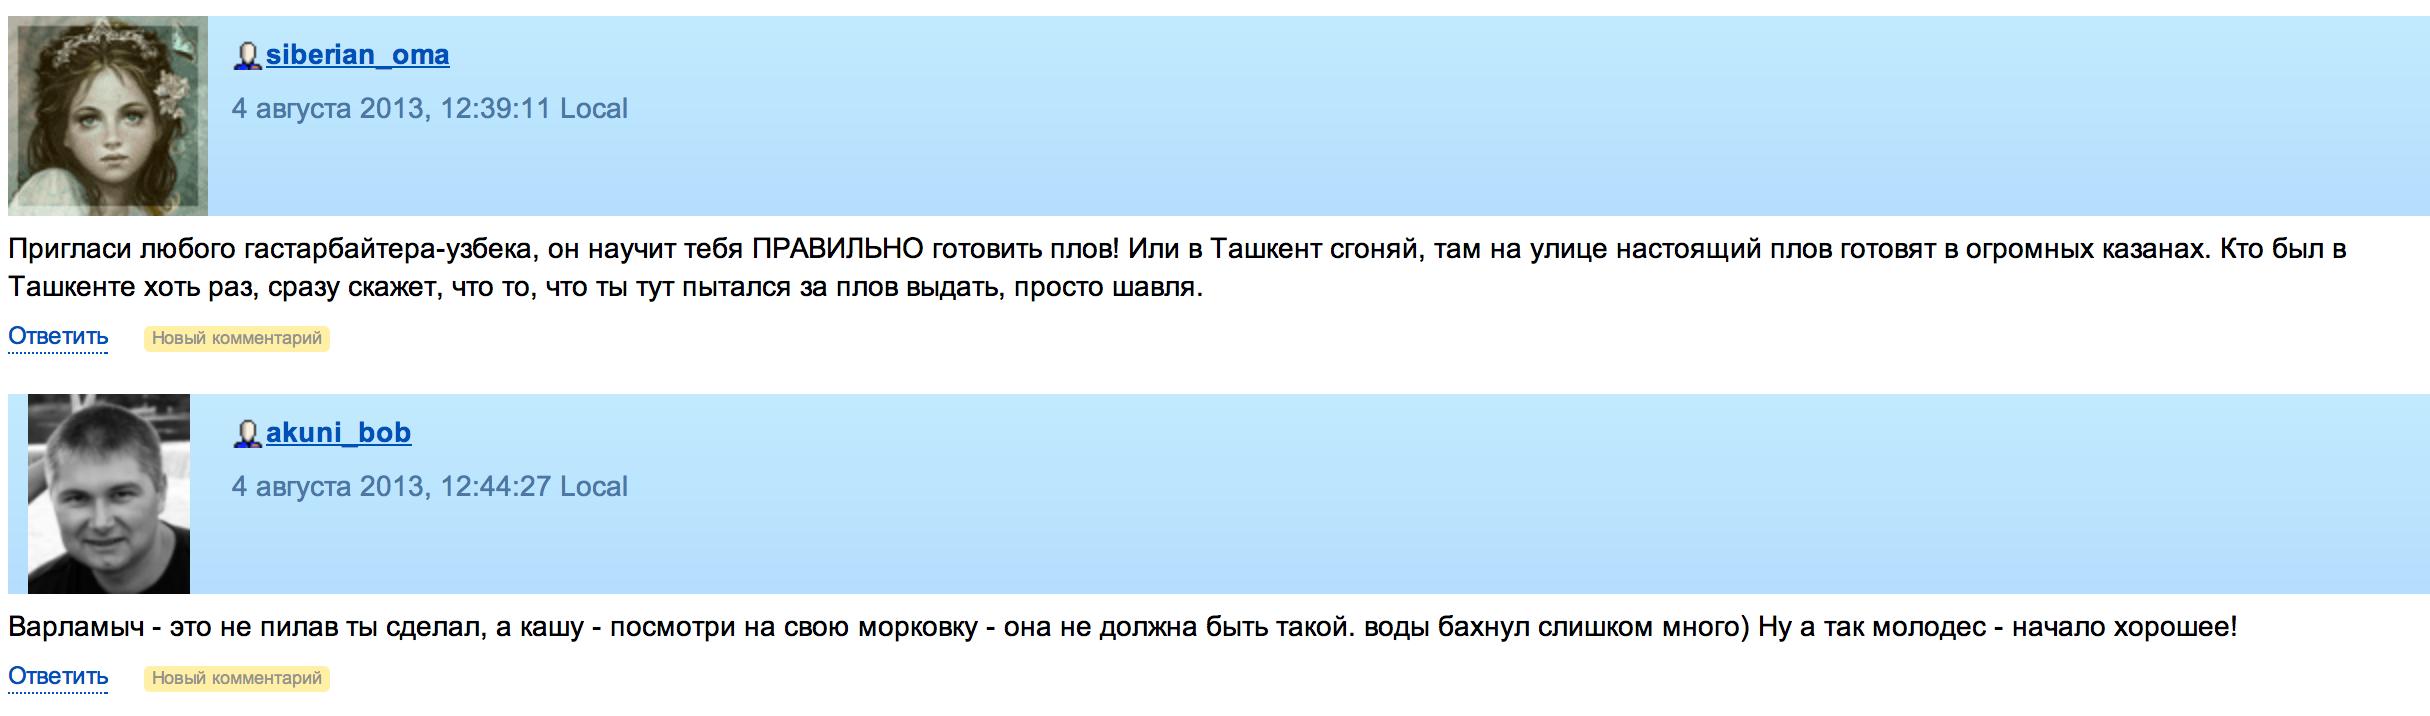 Снимок экрана 2013-08-04 в 12.52.10